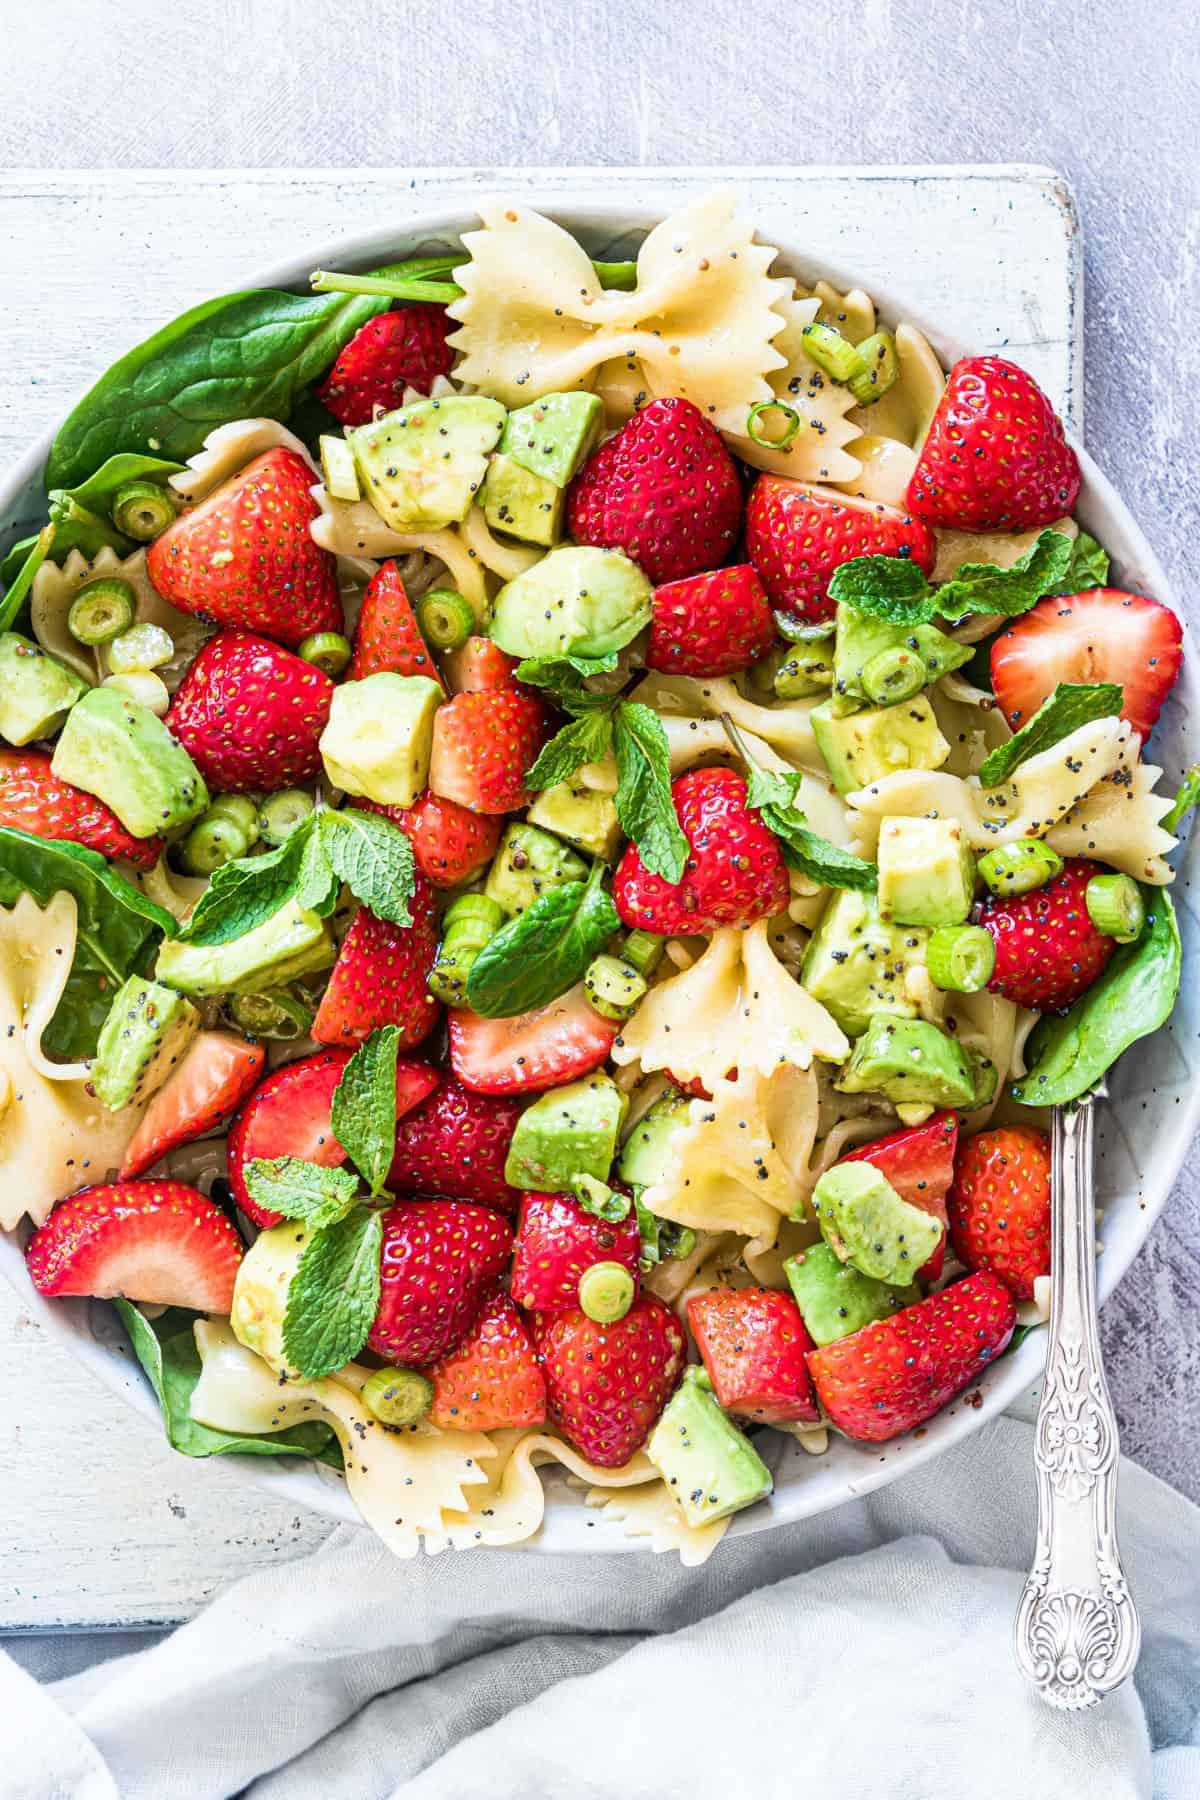 strawberry-avocado-pasta-salad-